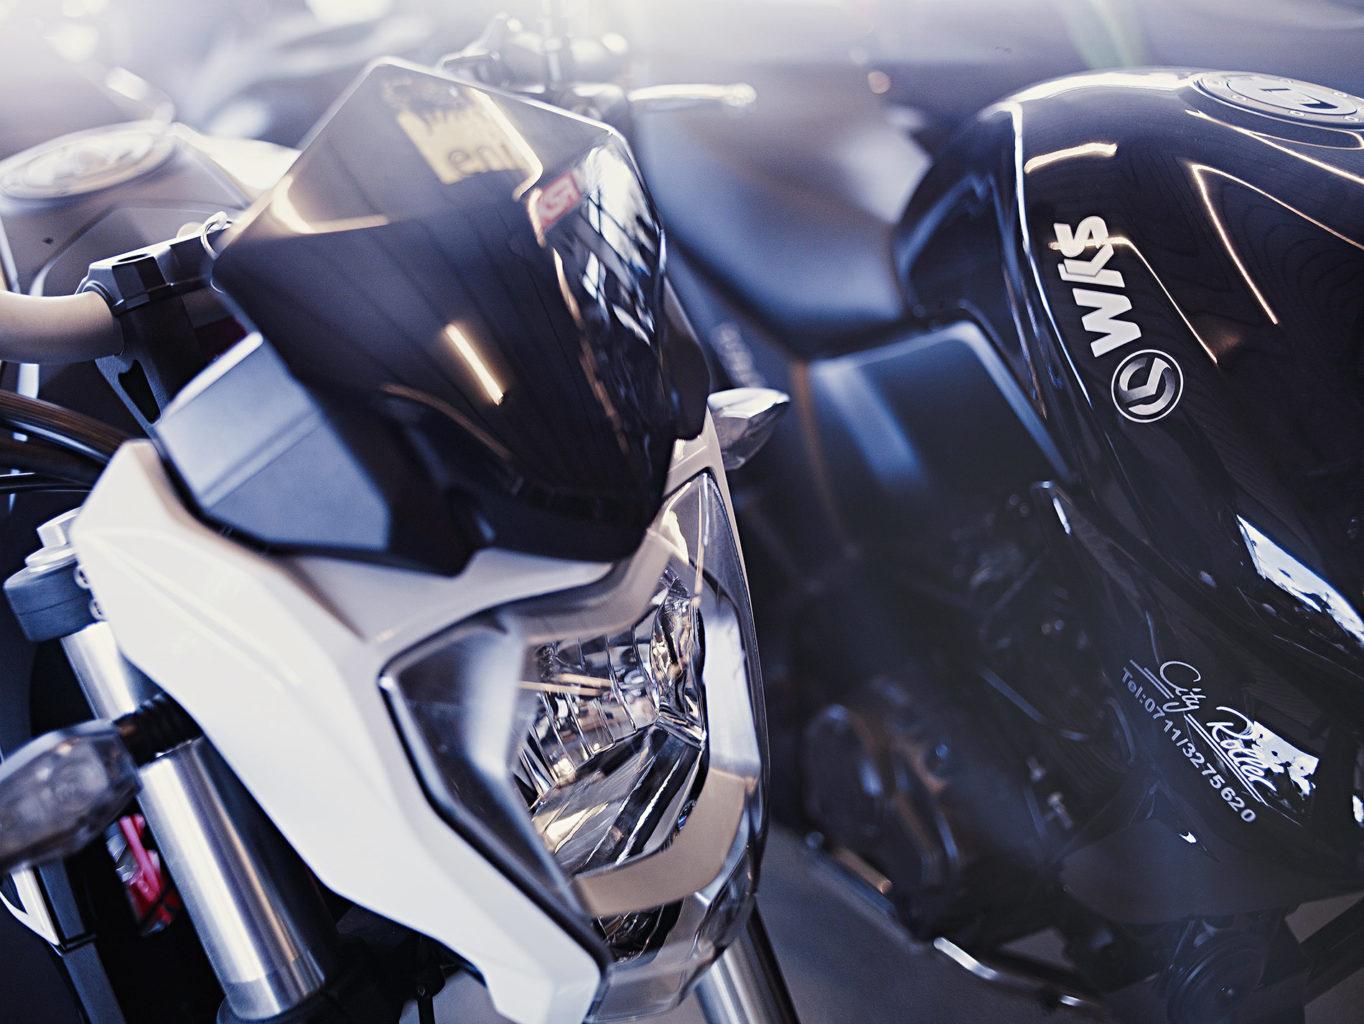 KSR_Moto_00143